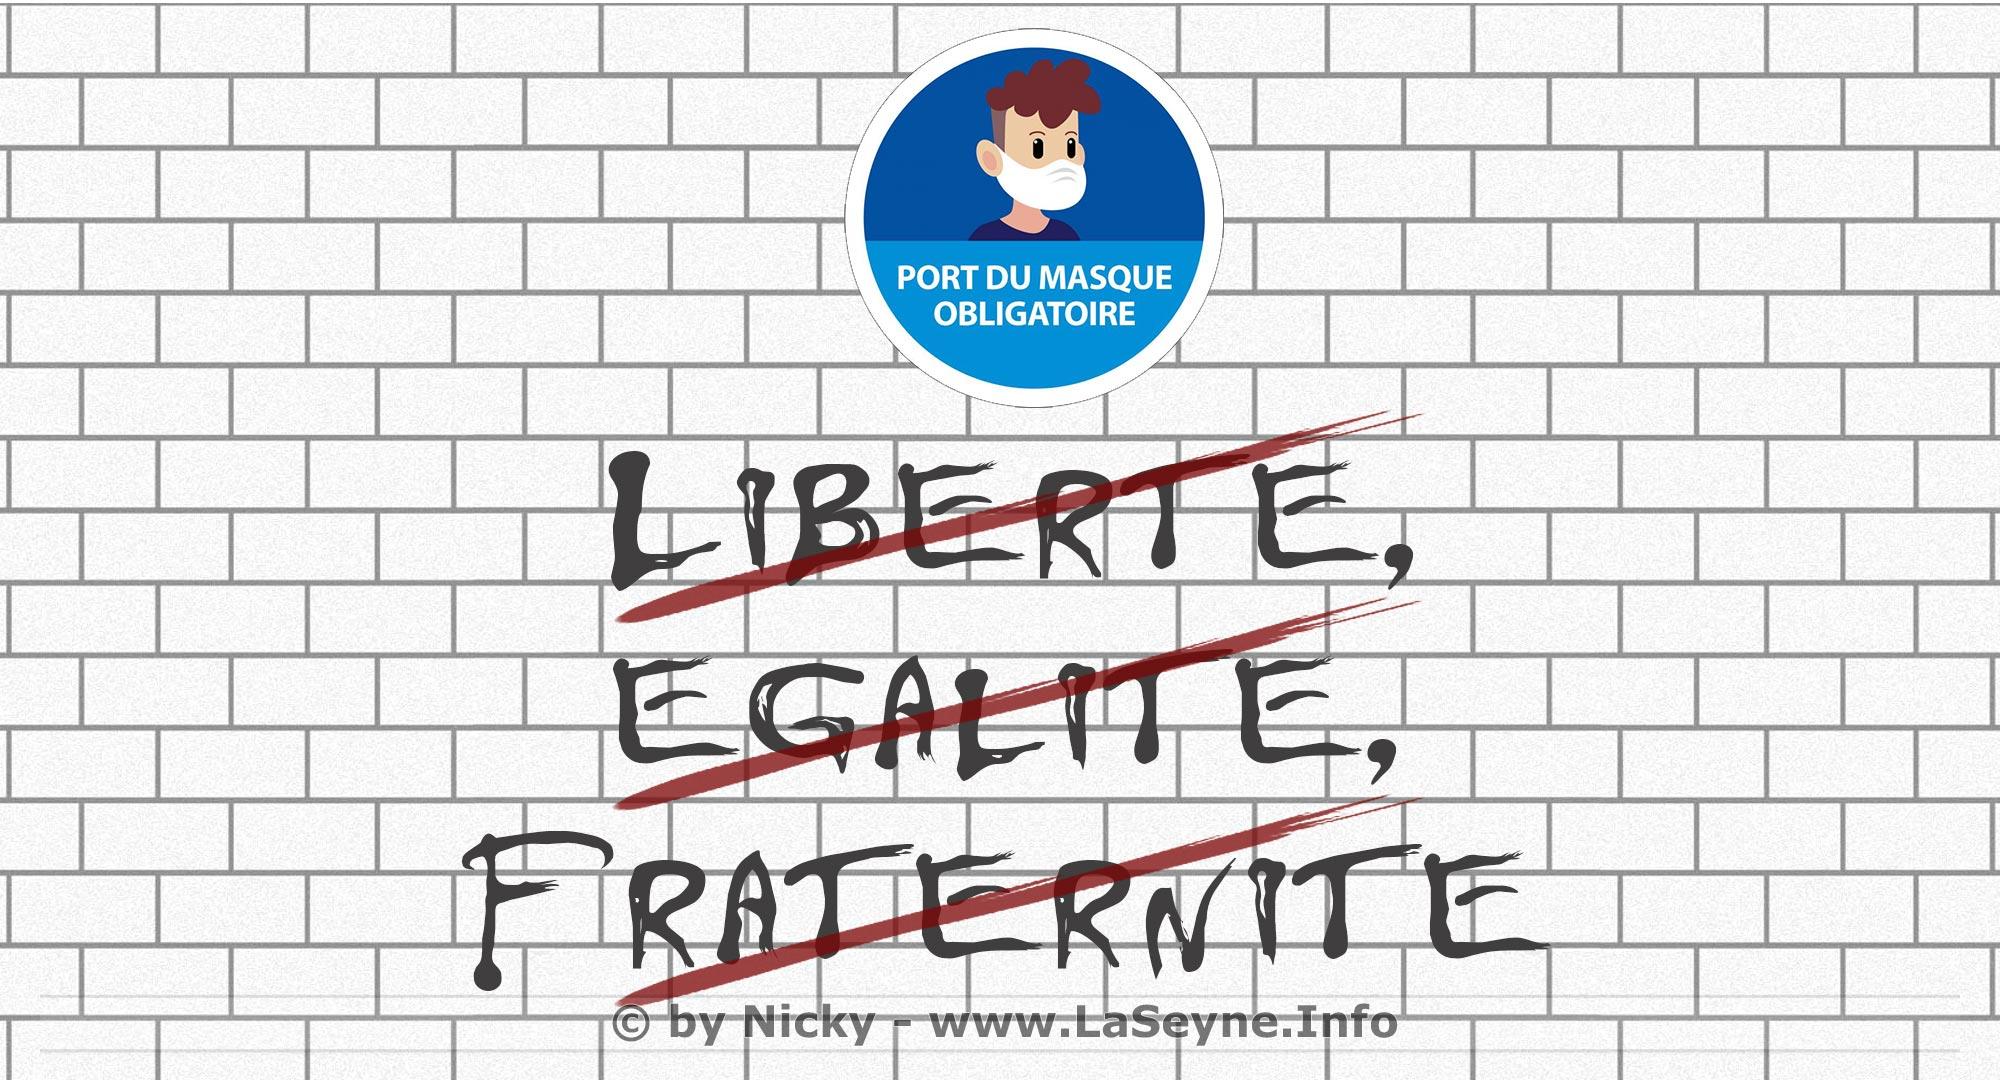 #Covid19: Obligation du Port du Masque à La Seyne,.. Rebelotte !